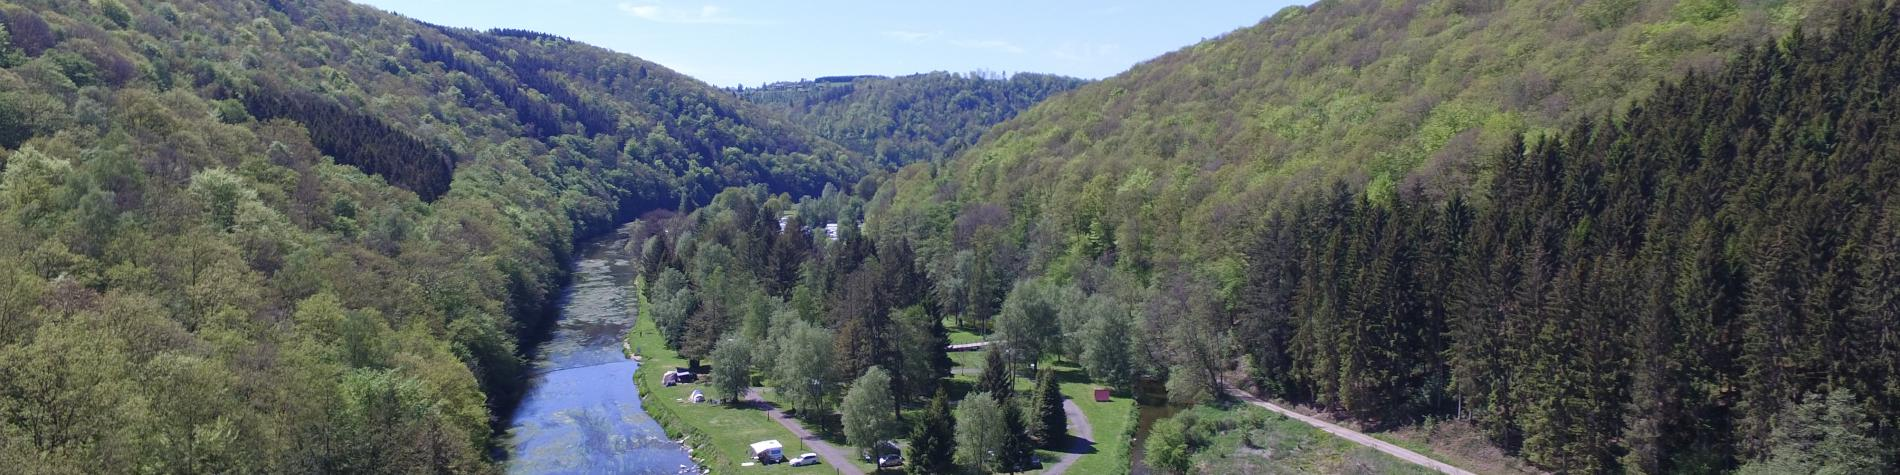 Camping Ile de Faigneul